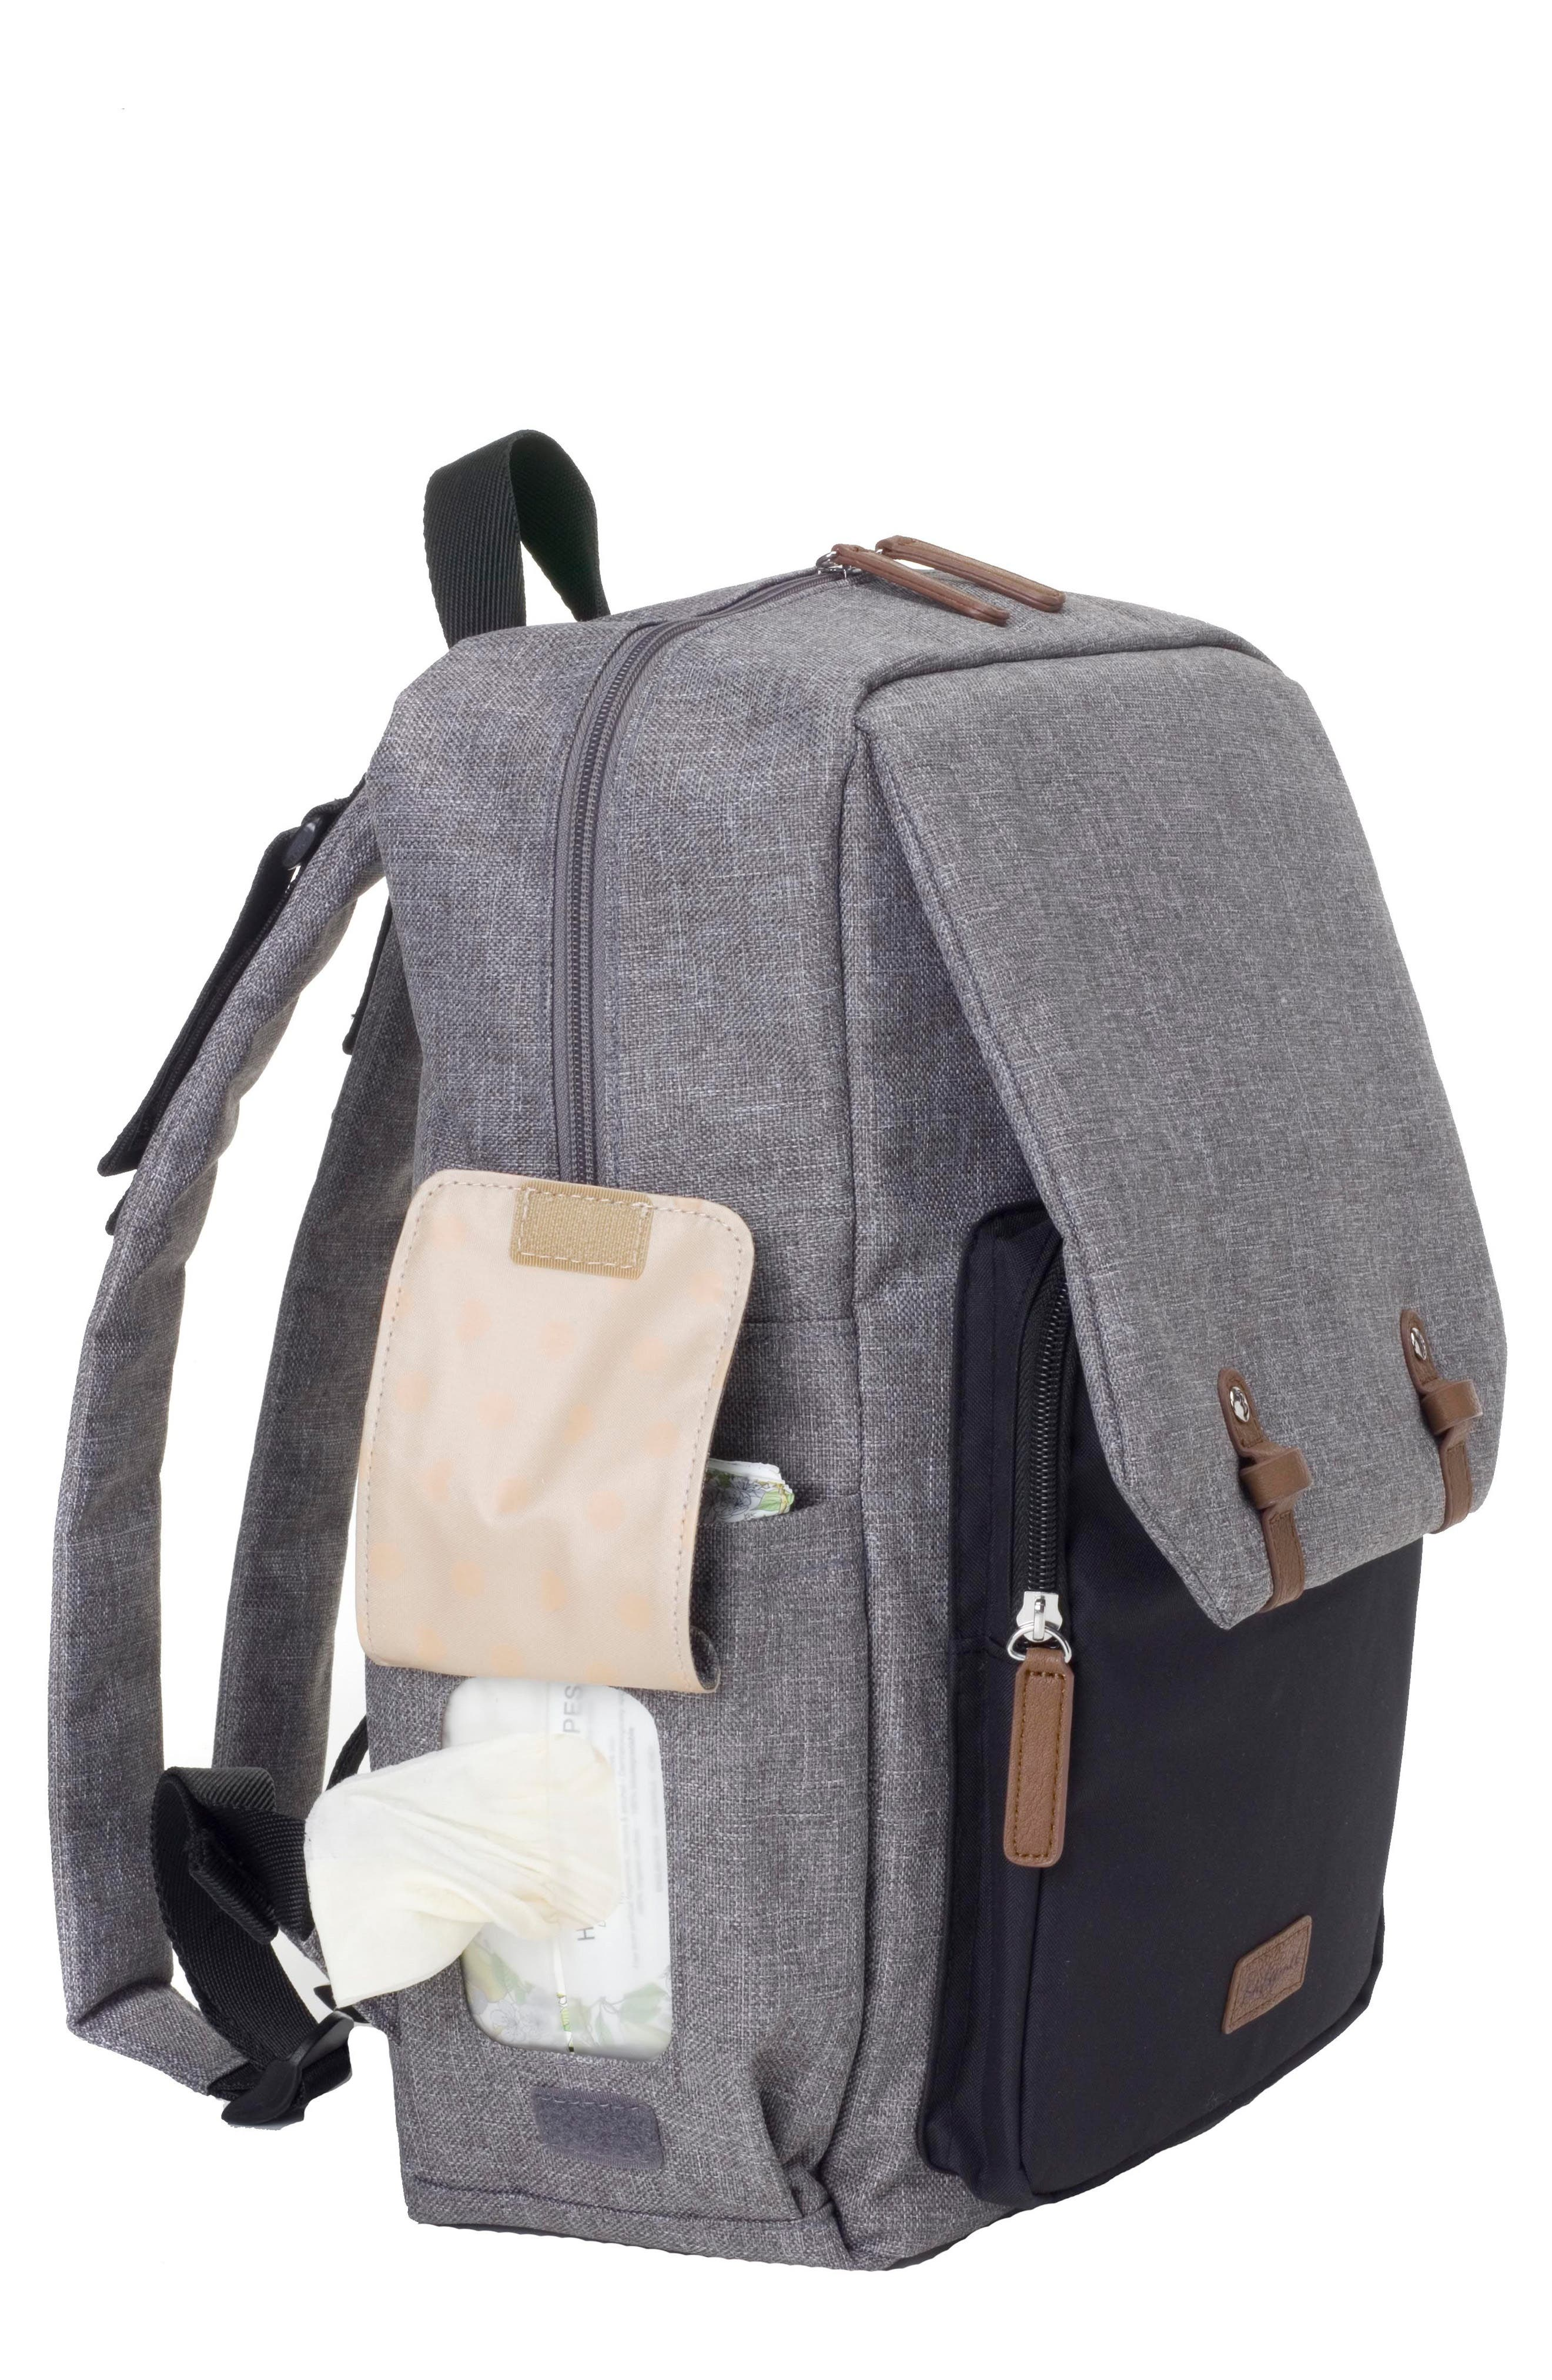 George Water Resistant Diaper Backpack,                             Alternate thumbnail 2, color,                             BLACK/ GREY